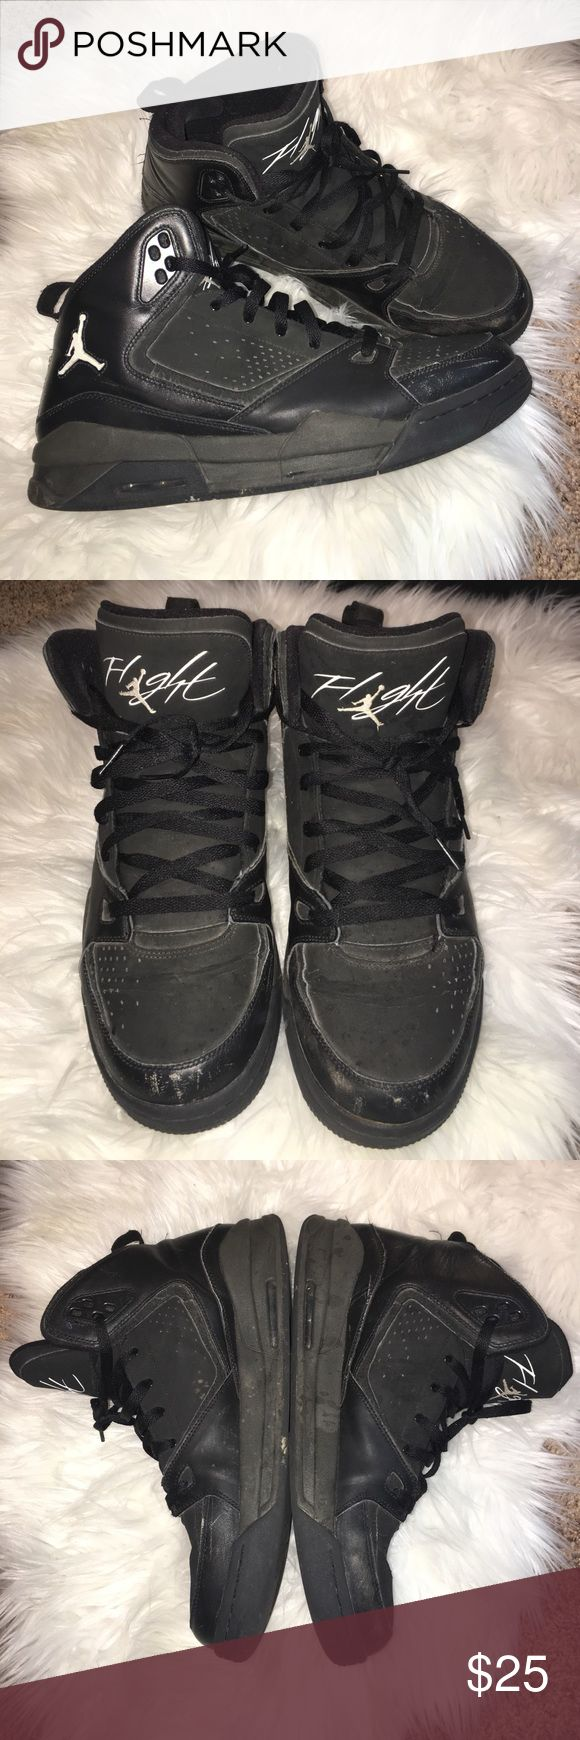 Nike Jordan basketball shoes flight Good/great shape, minor cosmetic flaws - see images. Air pockets still in tact Jordan Shoes